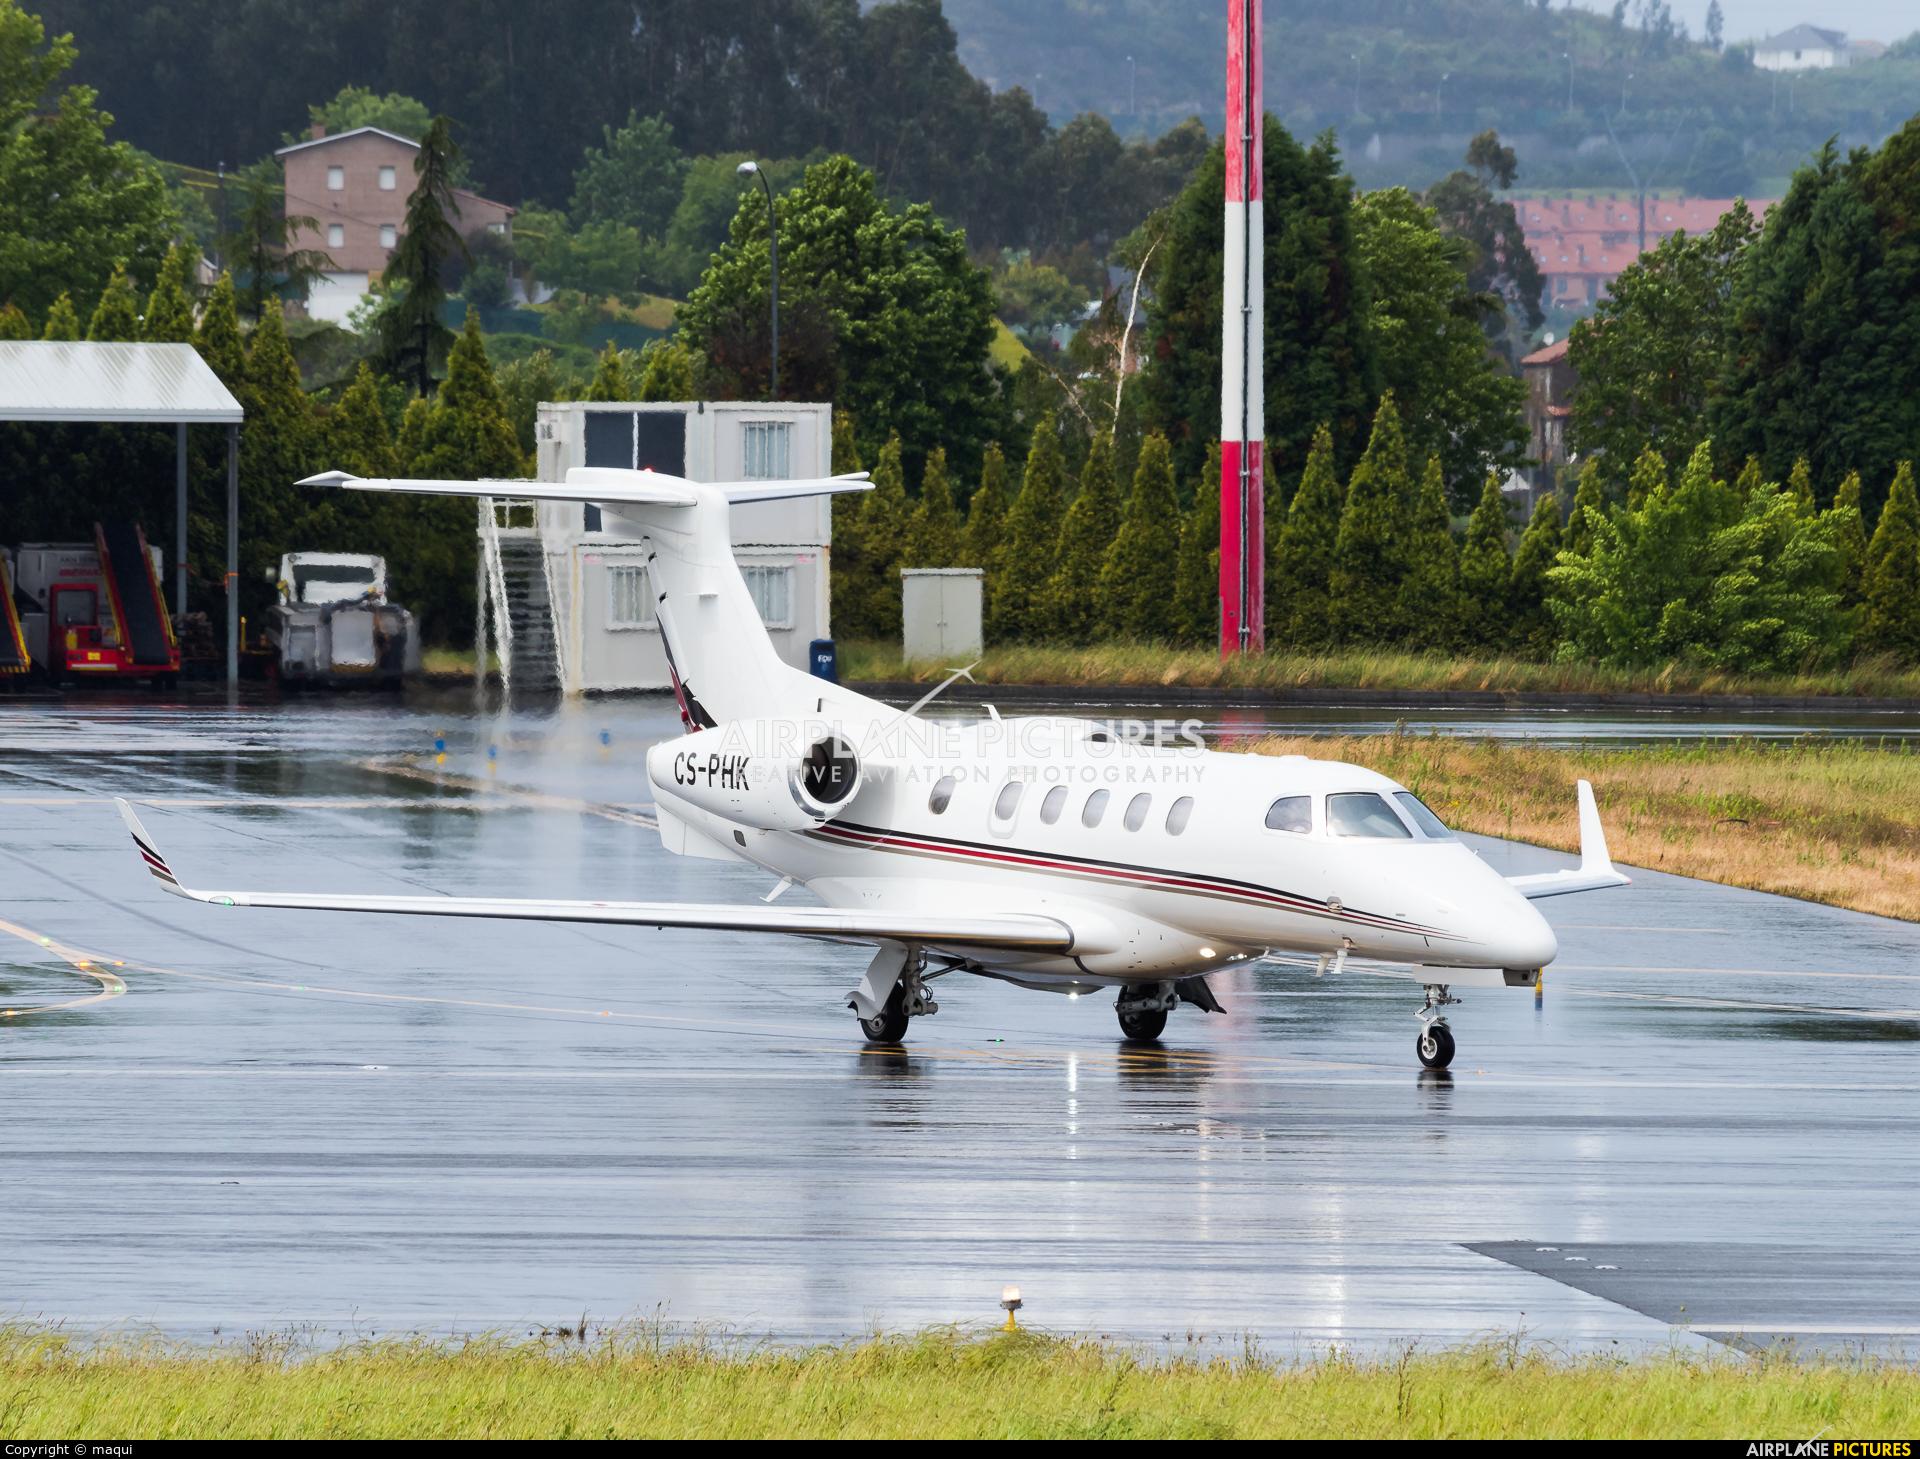 NetJets Europe (Portugal) CS-PHK aircraft at La Coruña